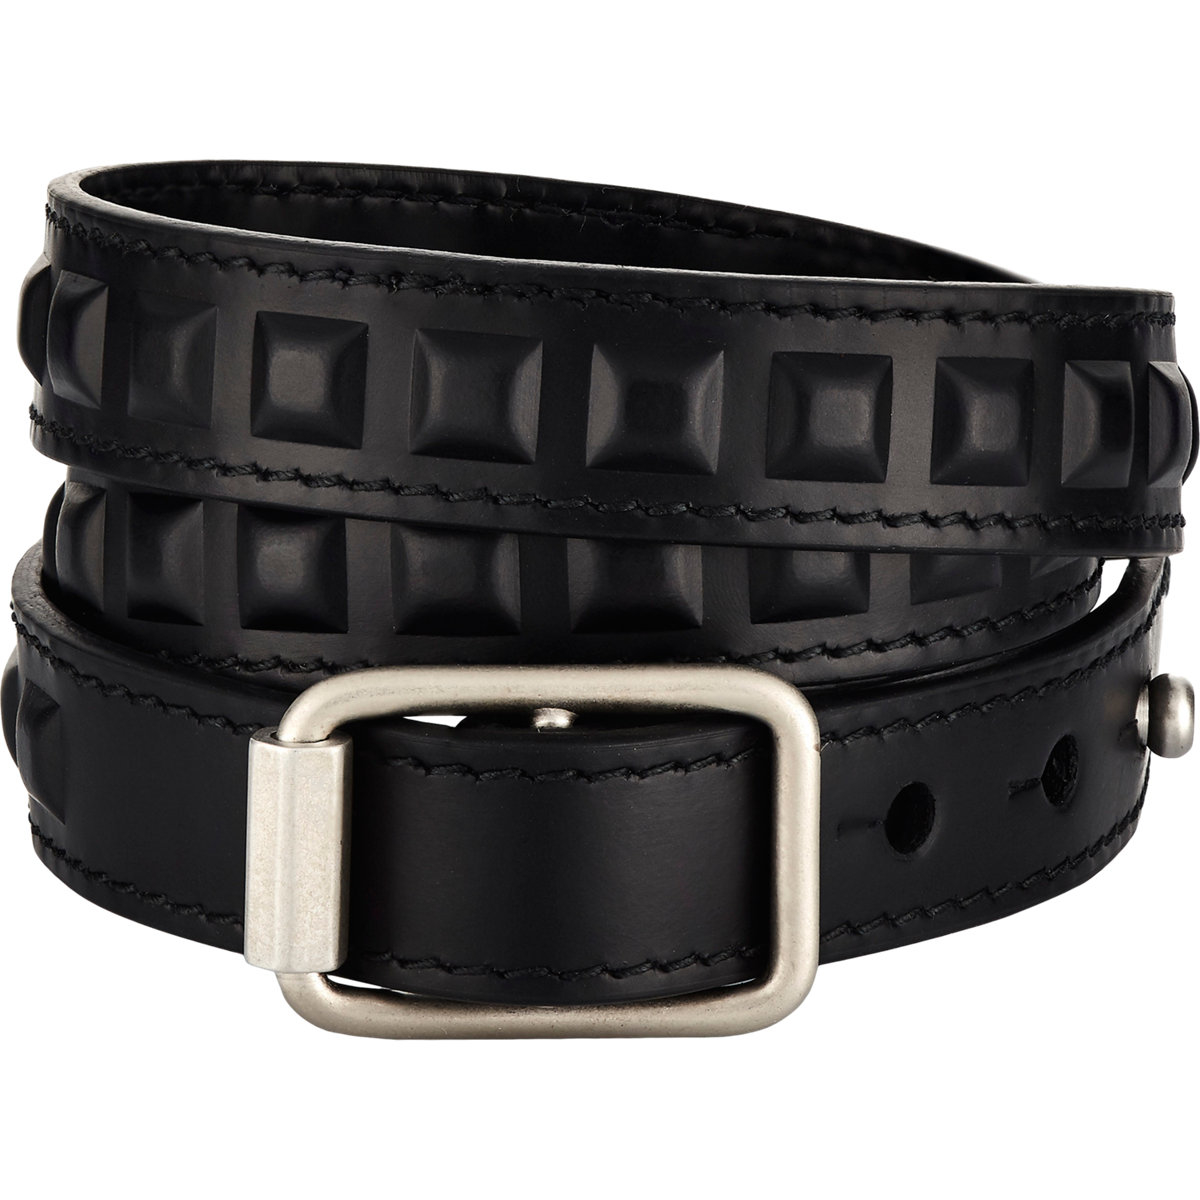 8d193a251aca3 Lyst - Balenciaga Embossed-grid Triple-wrap Bracelet in Black for Men